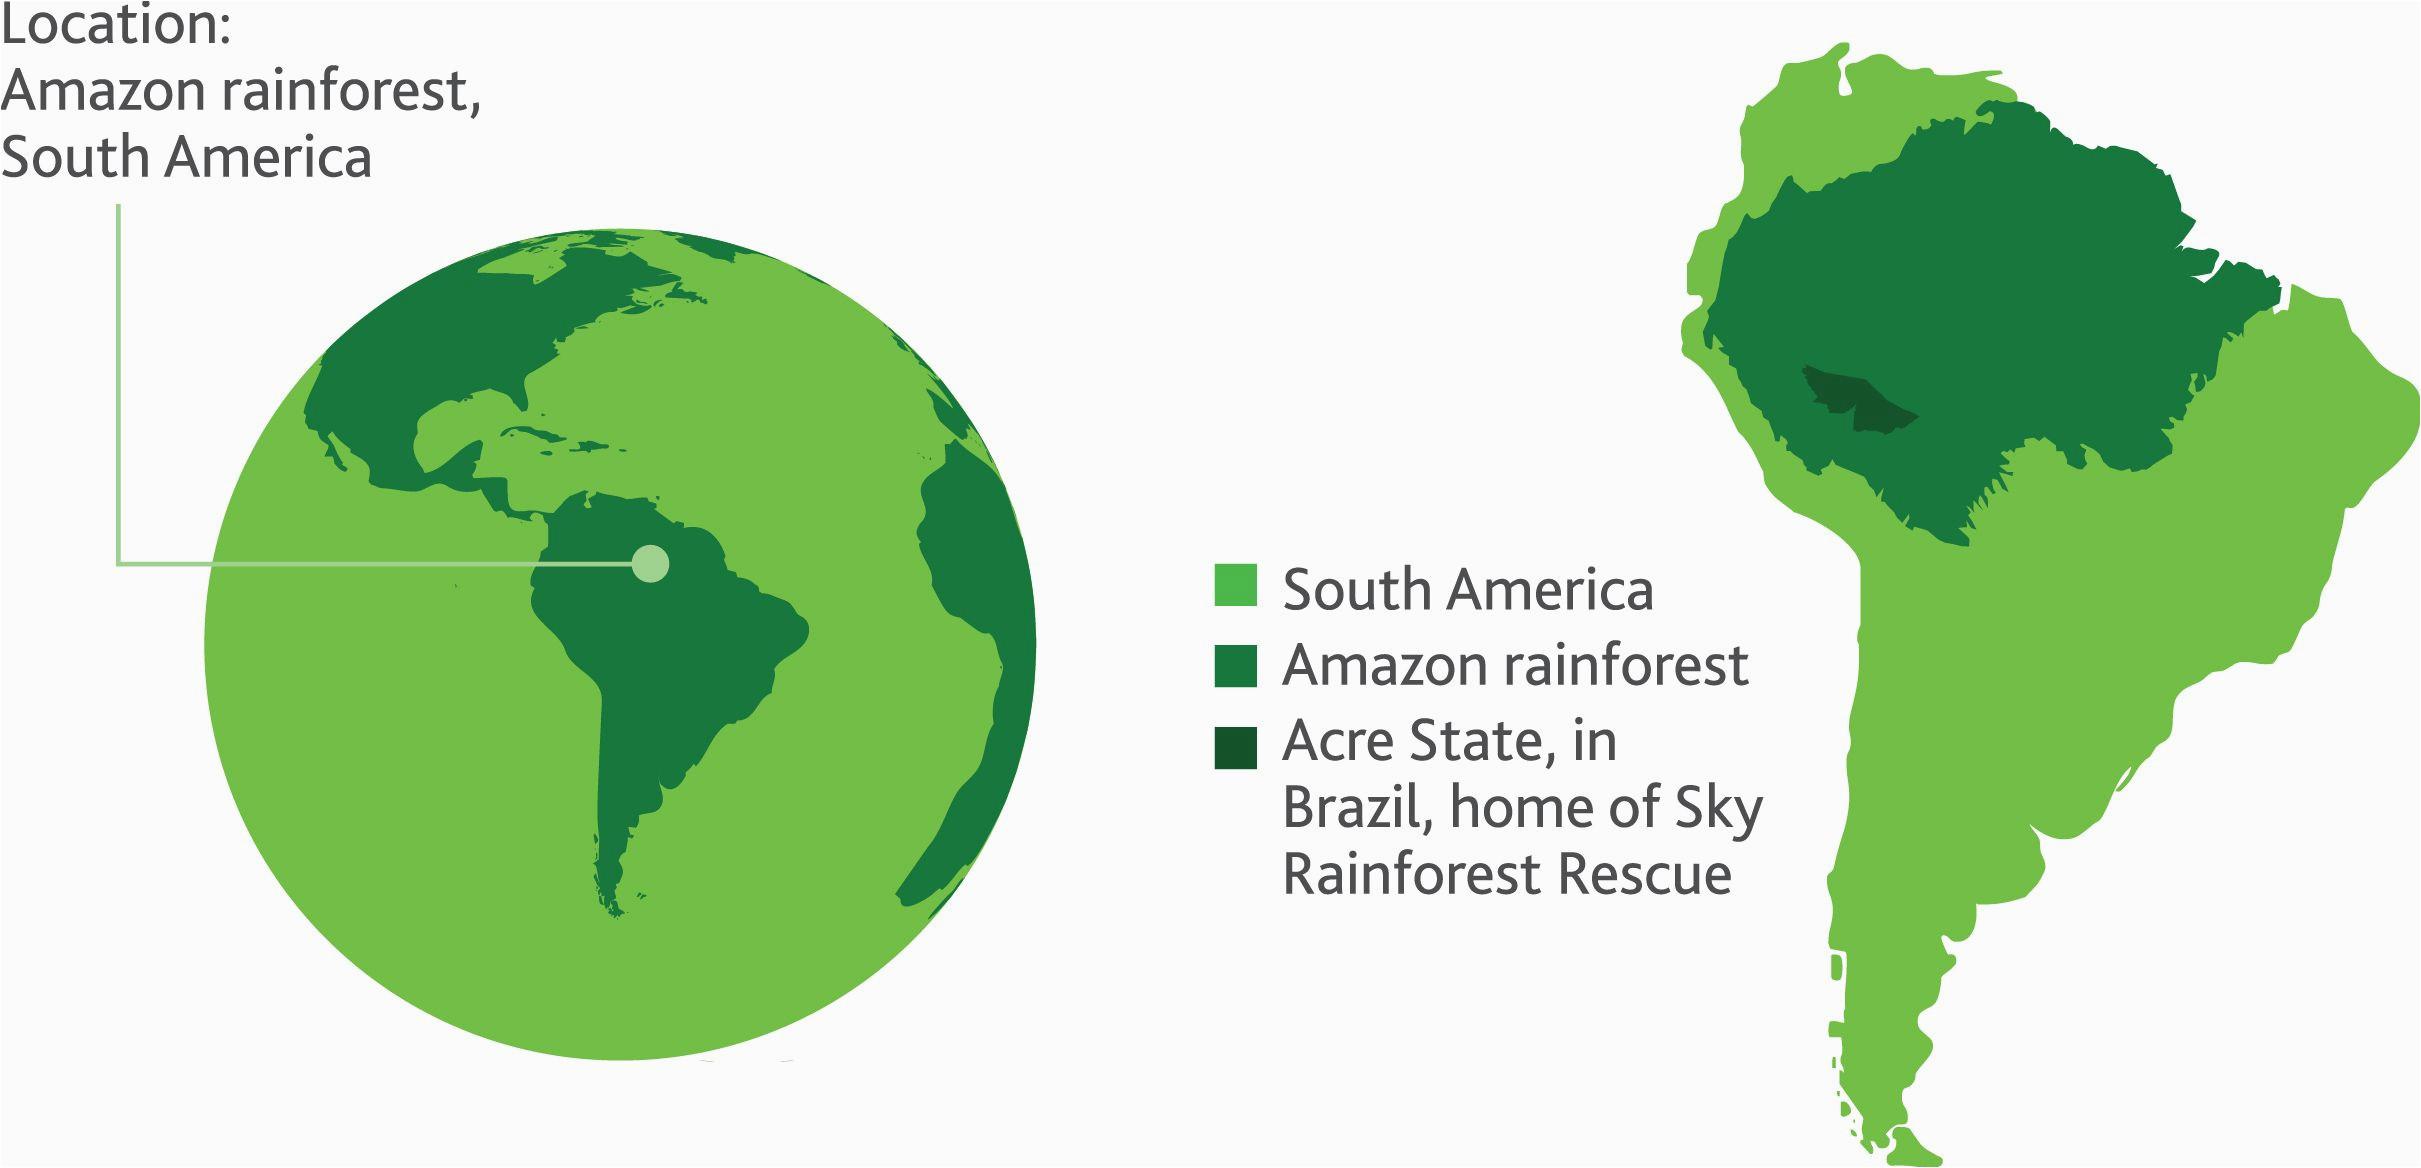 amazon rainforest map google search south america